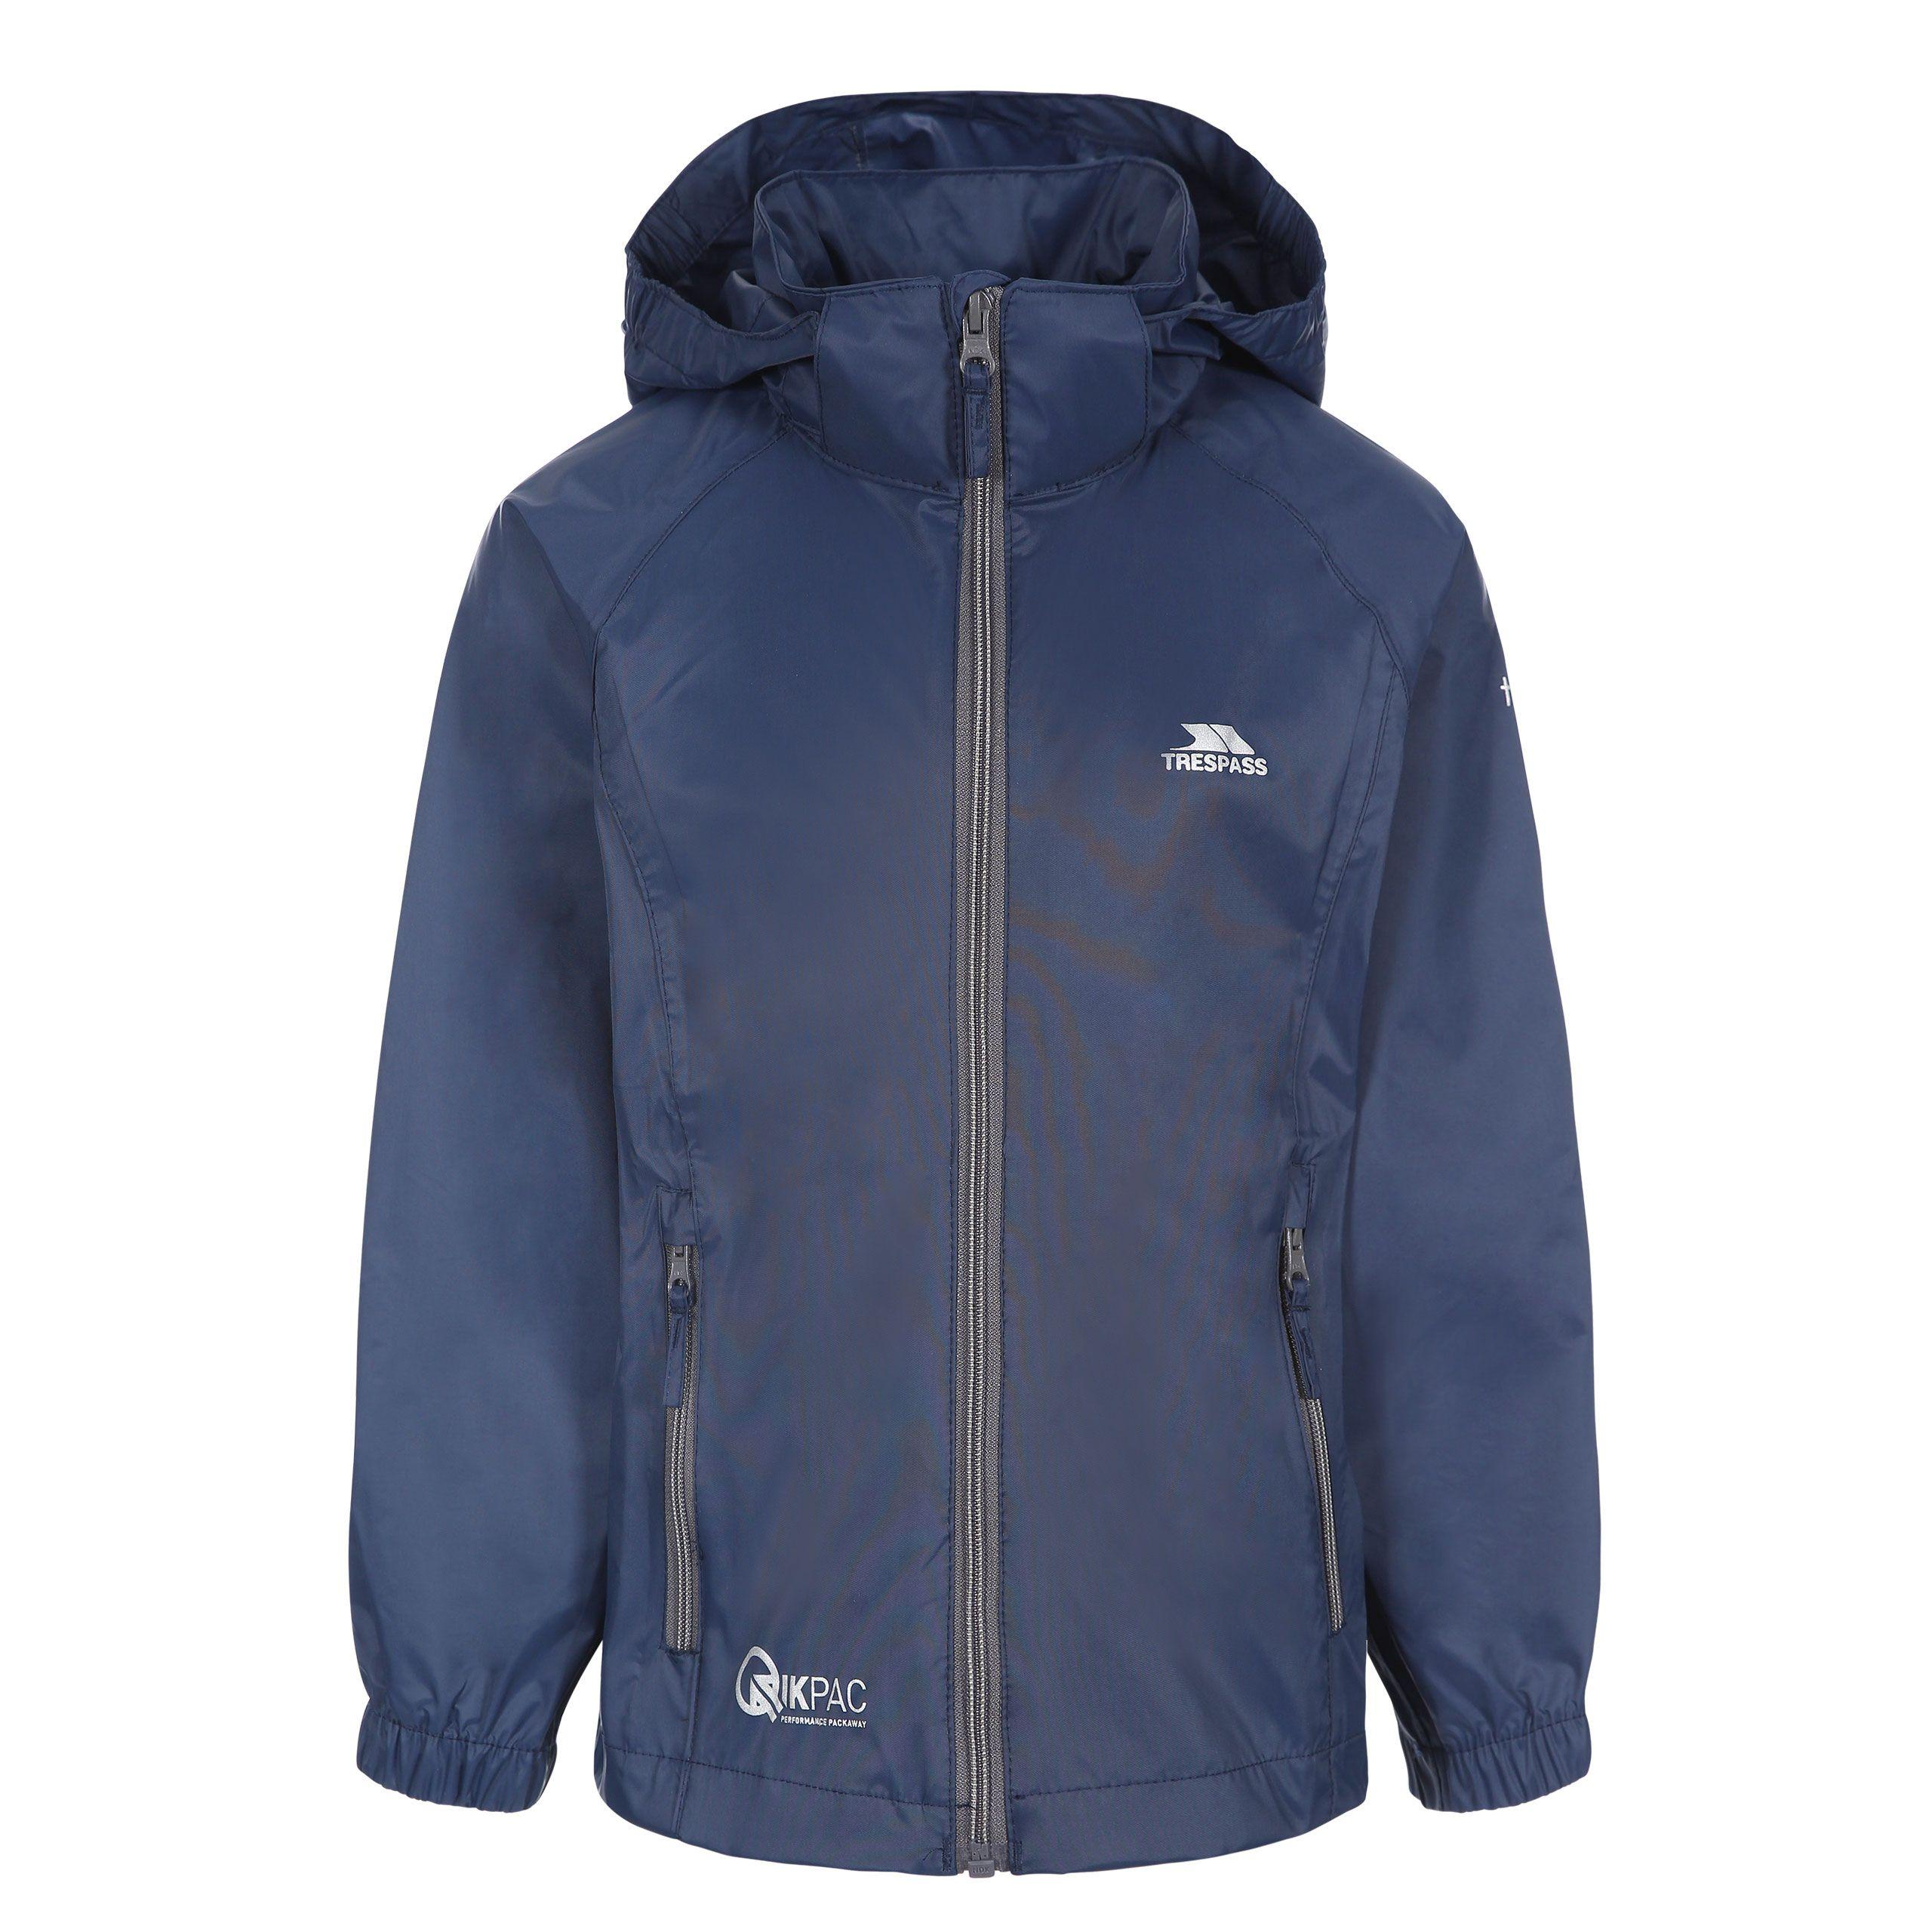 Trespass Kids Waterproof Packaway Jacket Zip Hood Qikpac X